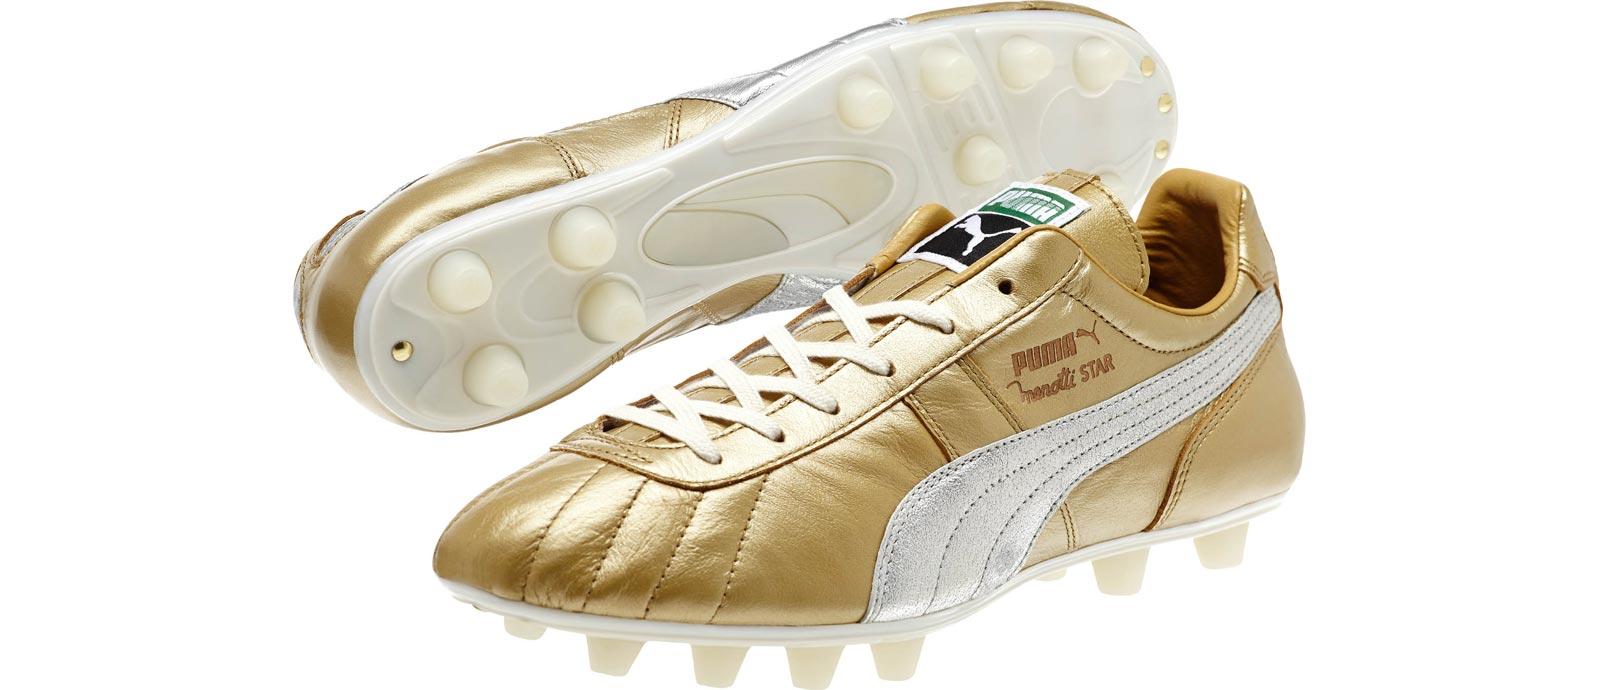 gold puma boots cheap   OFF79% Discounted 4a3d8a074